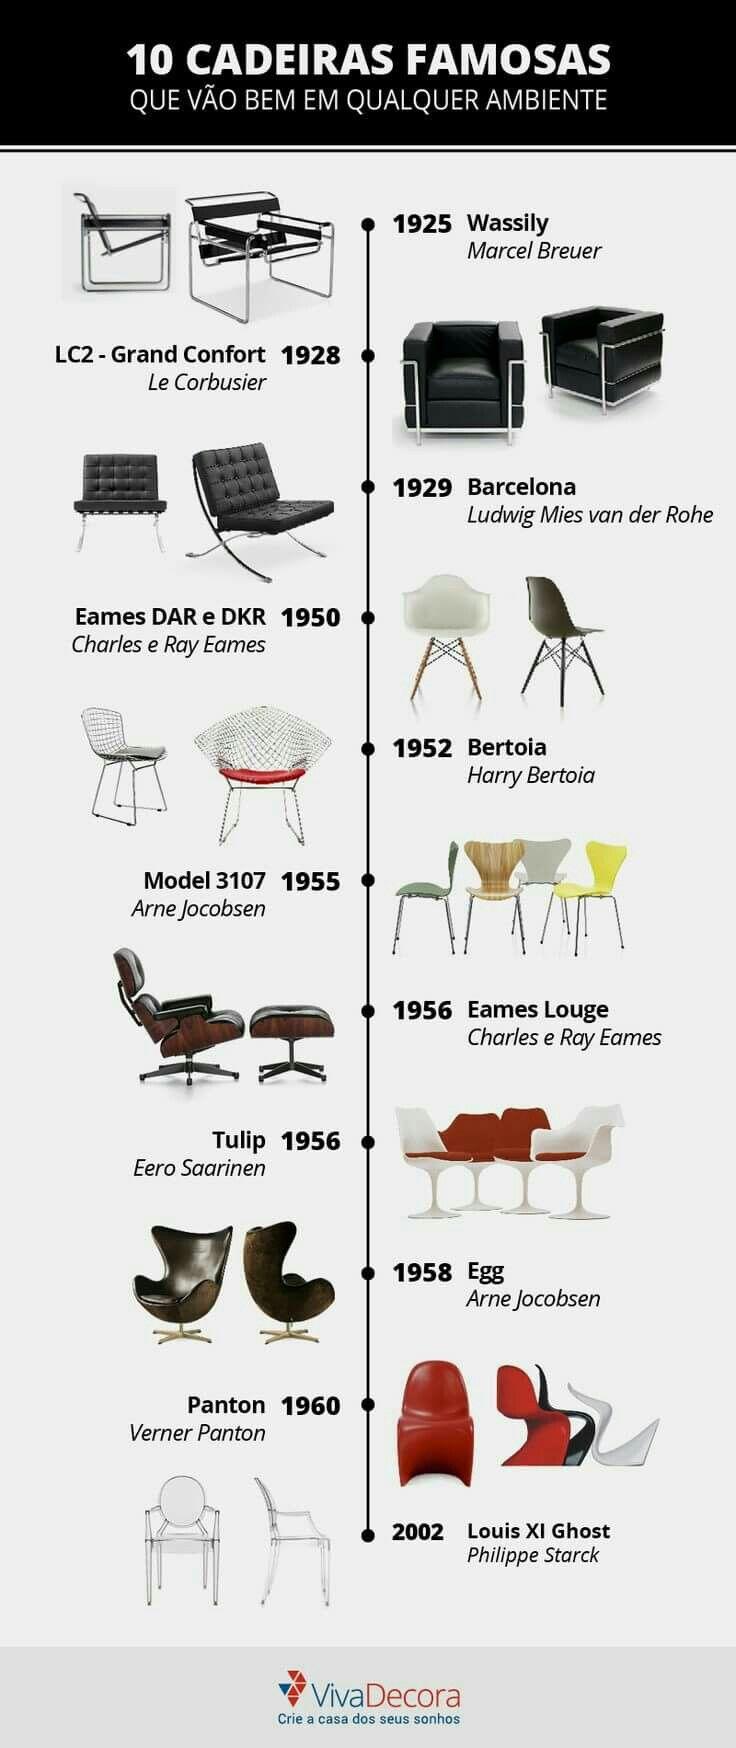 Cadeiras famosas